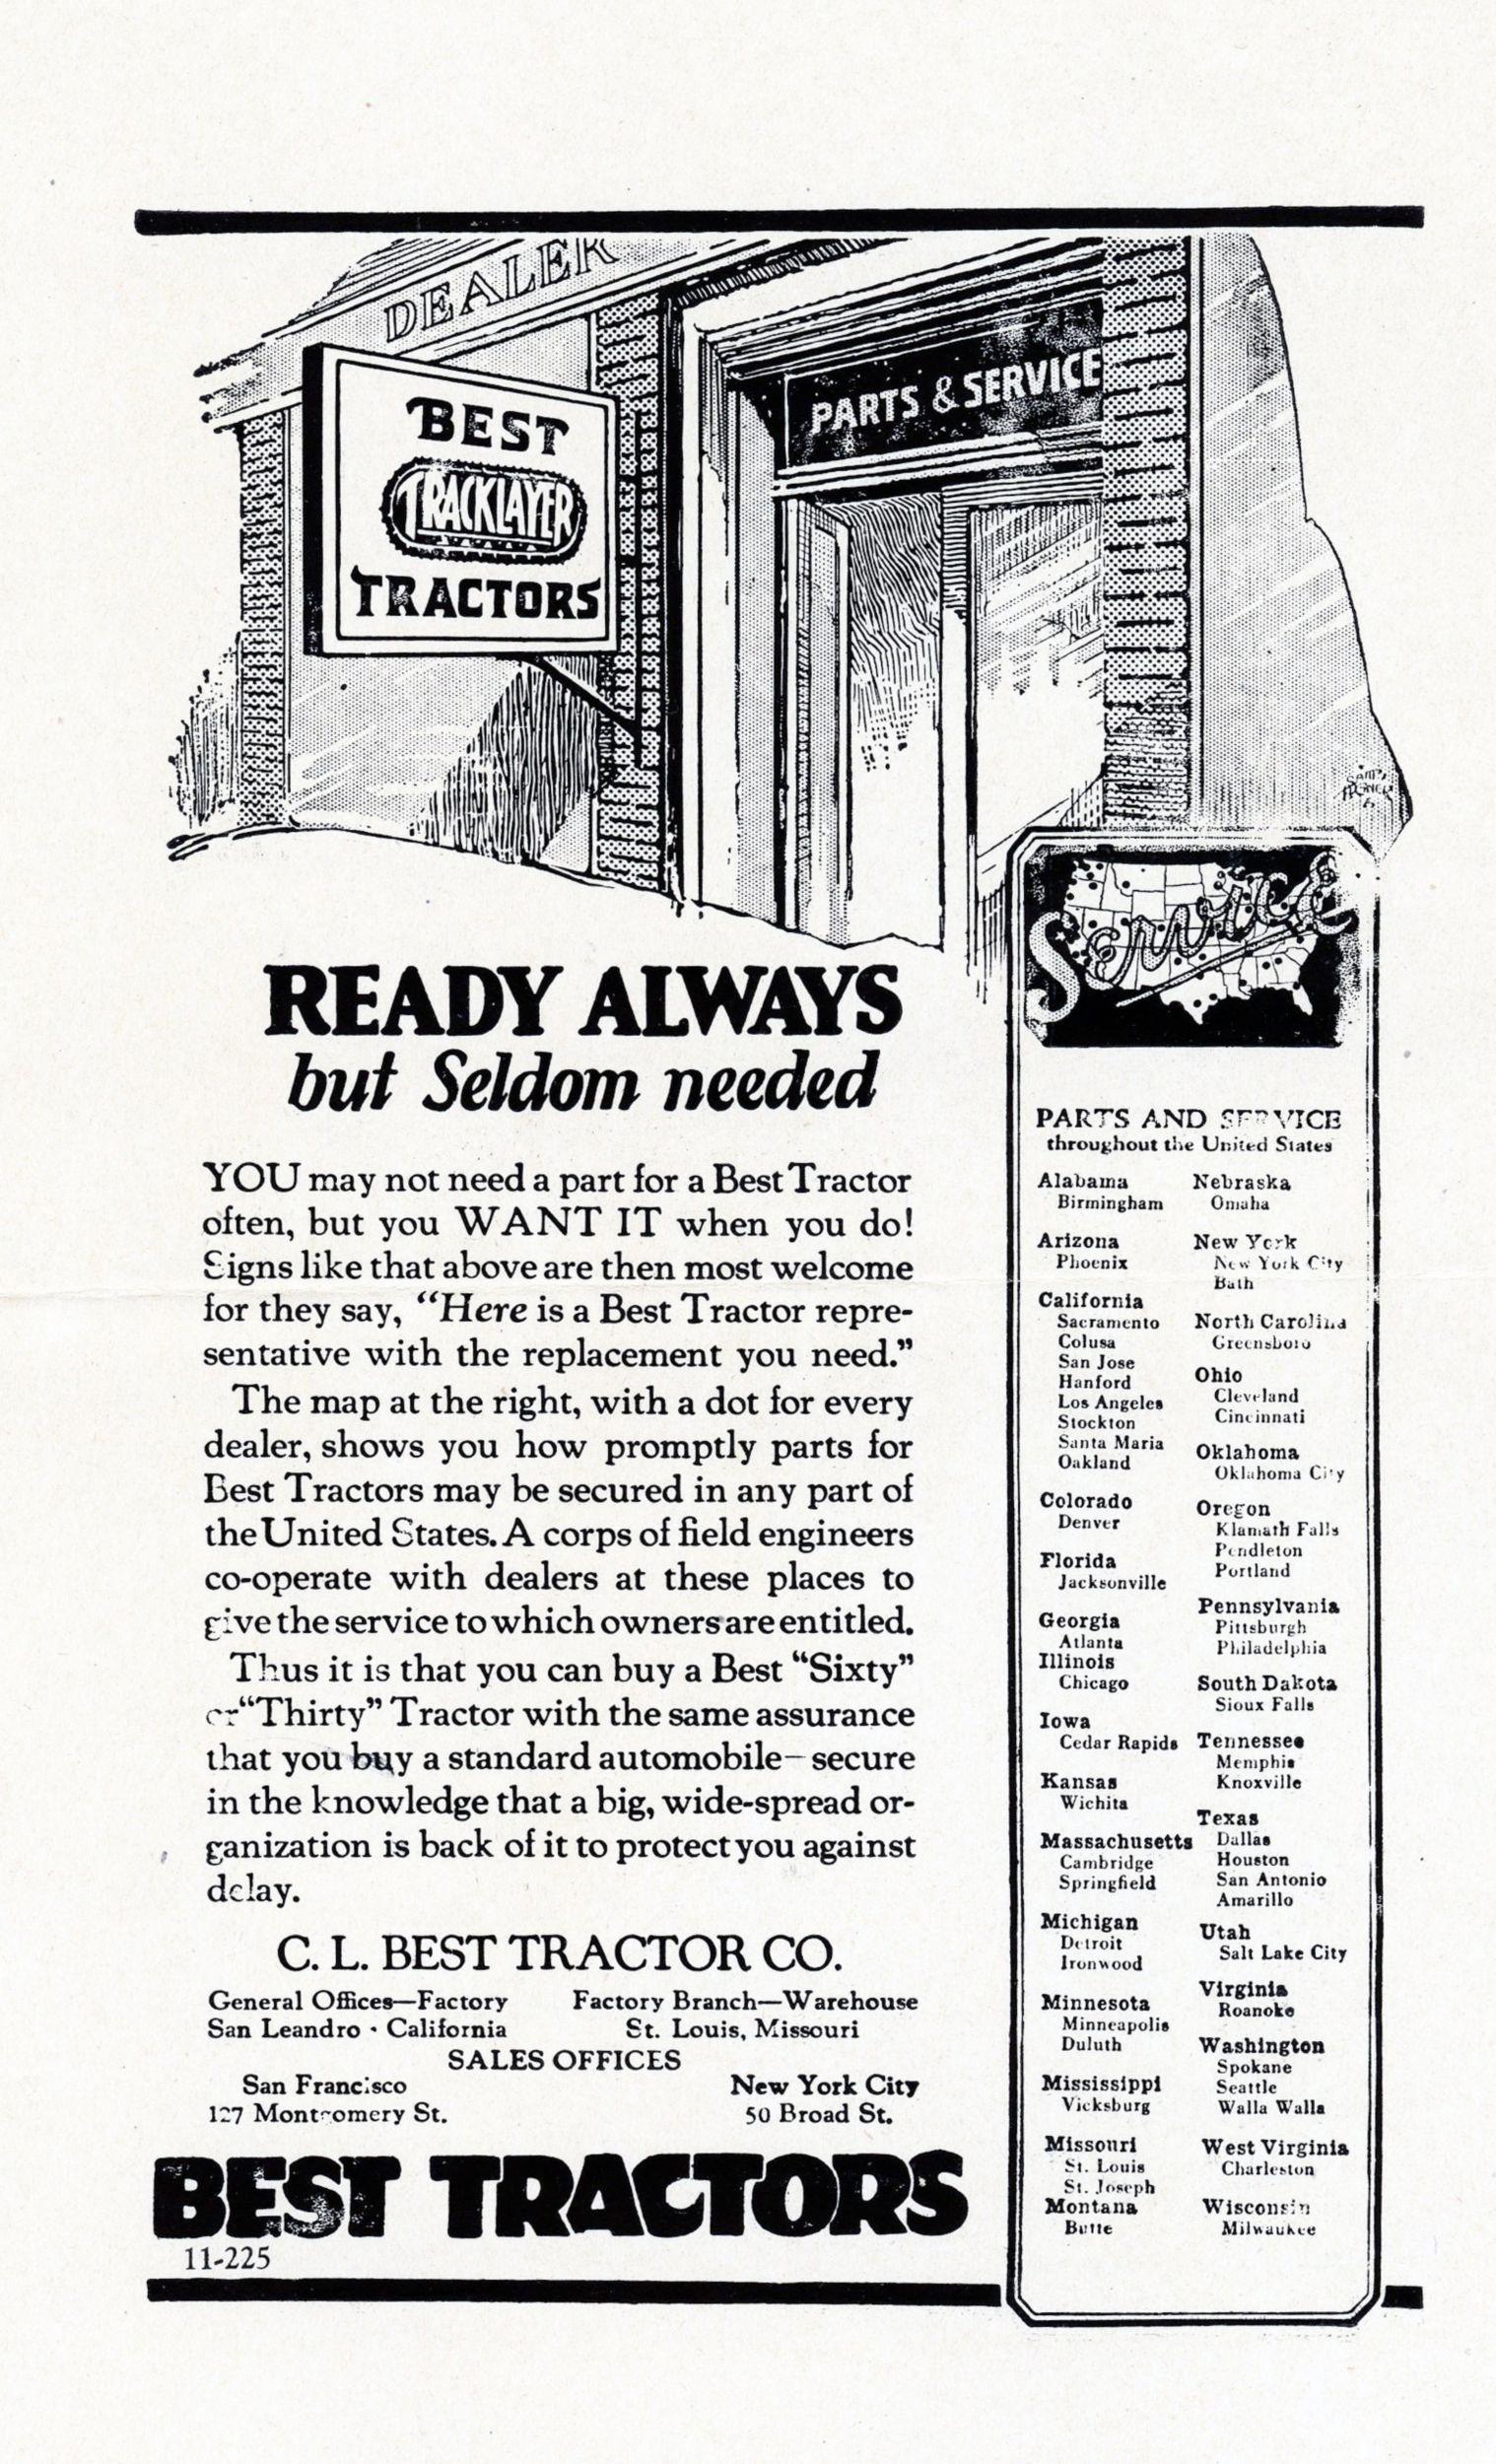 C. L. Best Tractor Co., Print Advertisement, 1925.